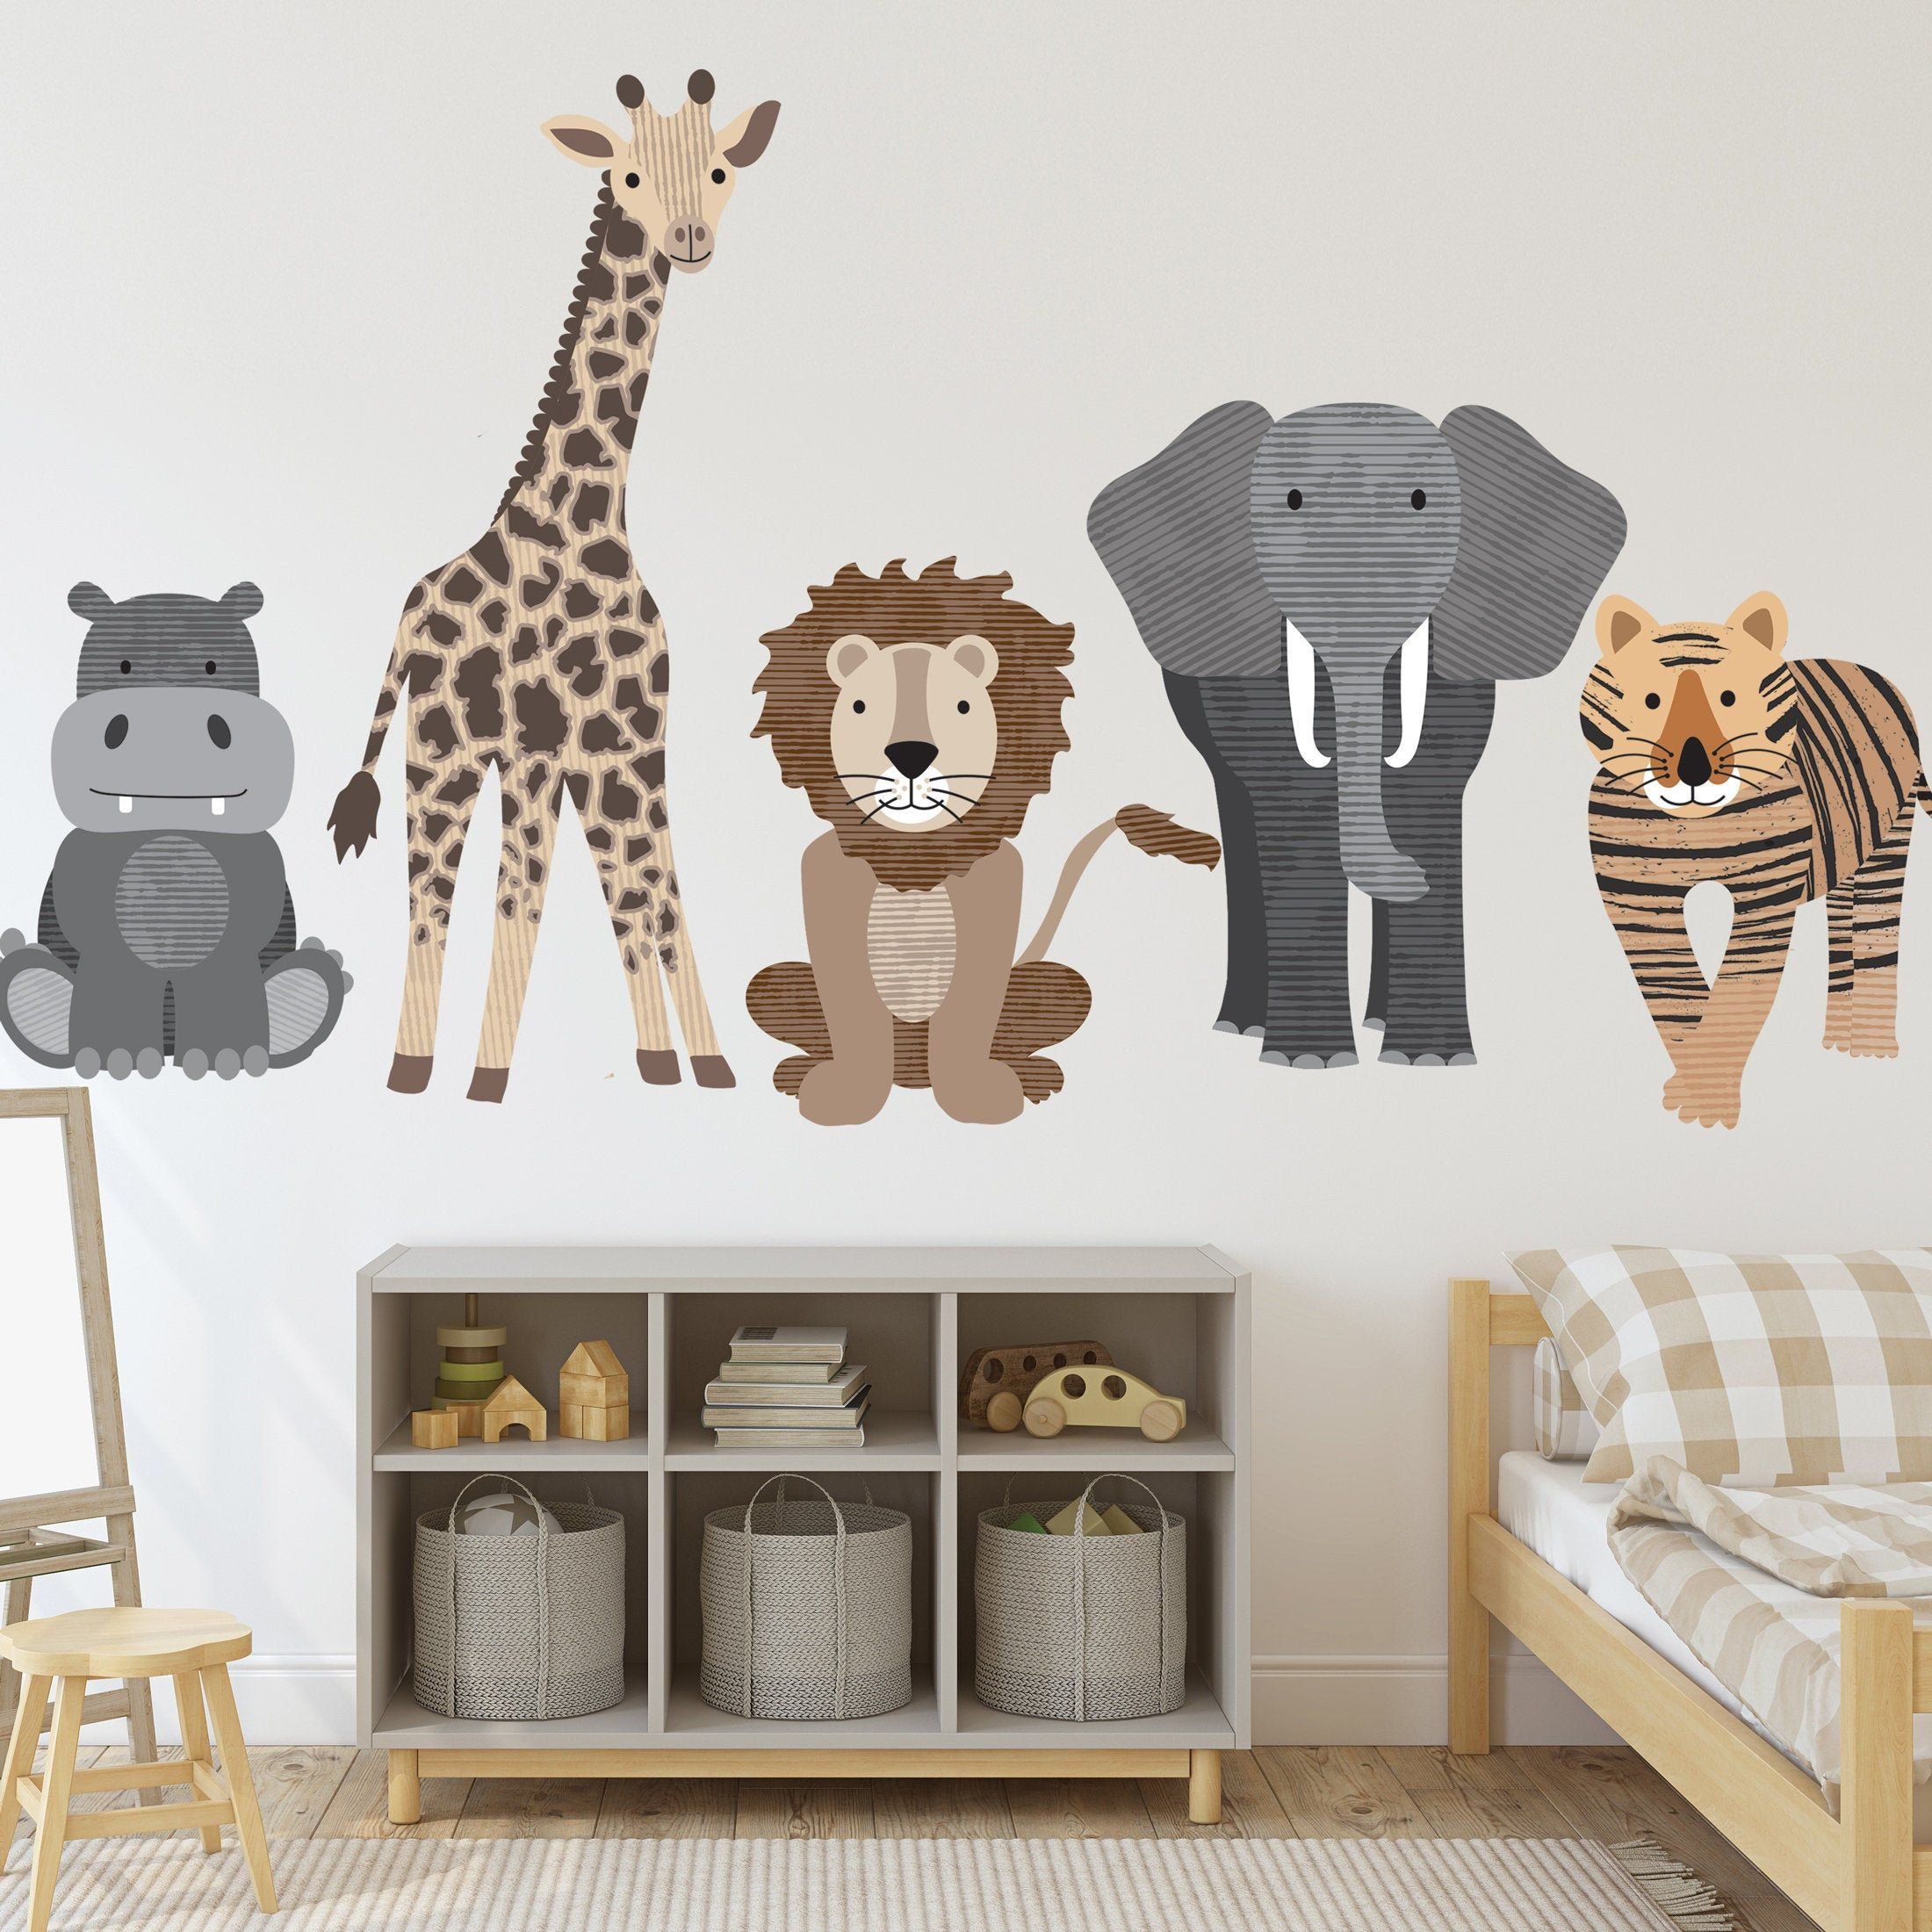 large safari animal wall decals nursery wall decals on wall decals id=61435